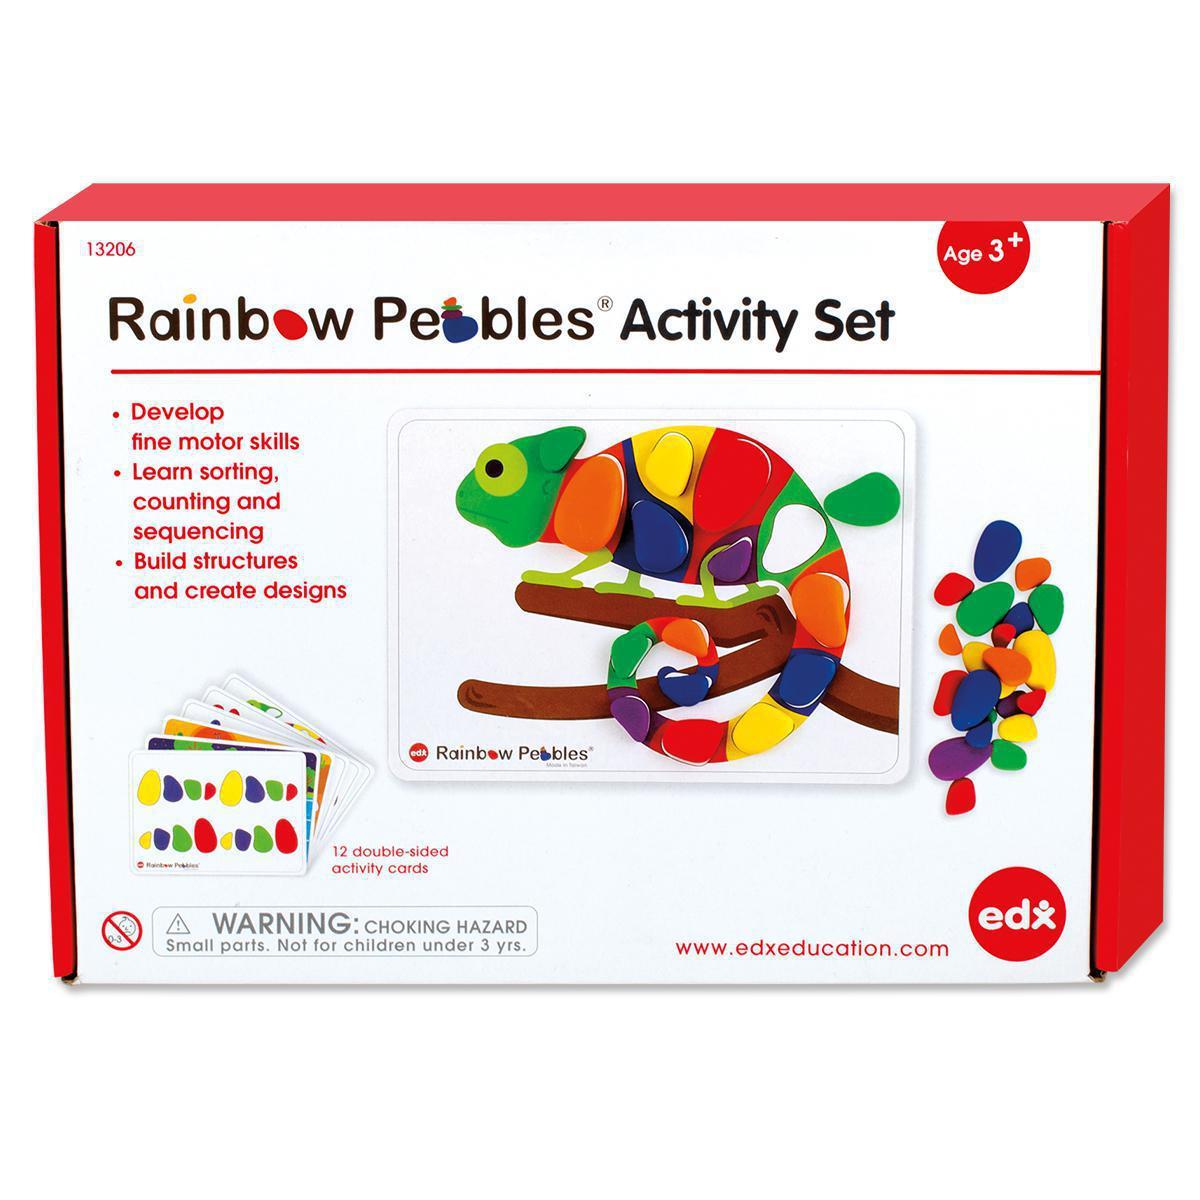 Rainbow Pebbles® Activity Set